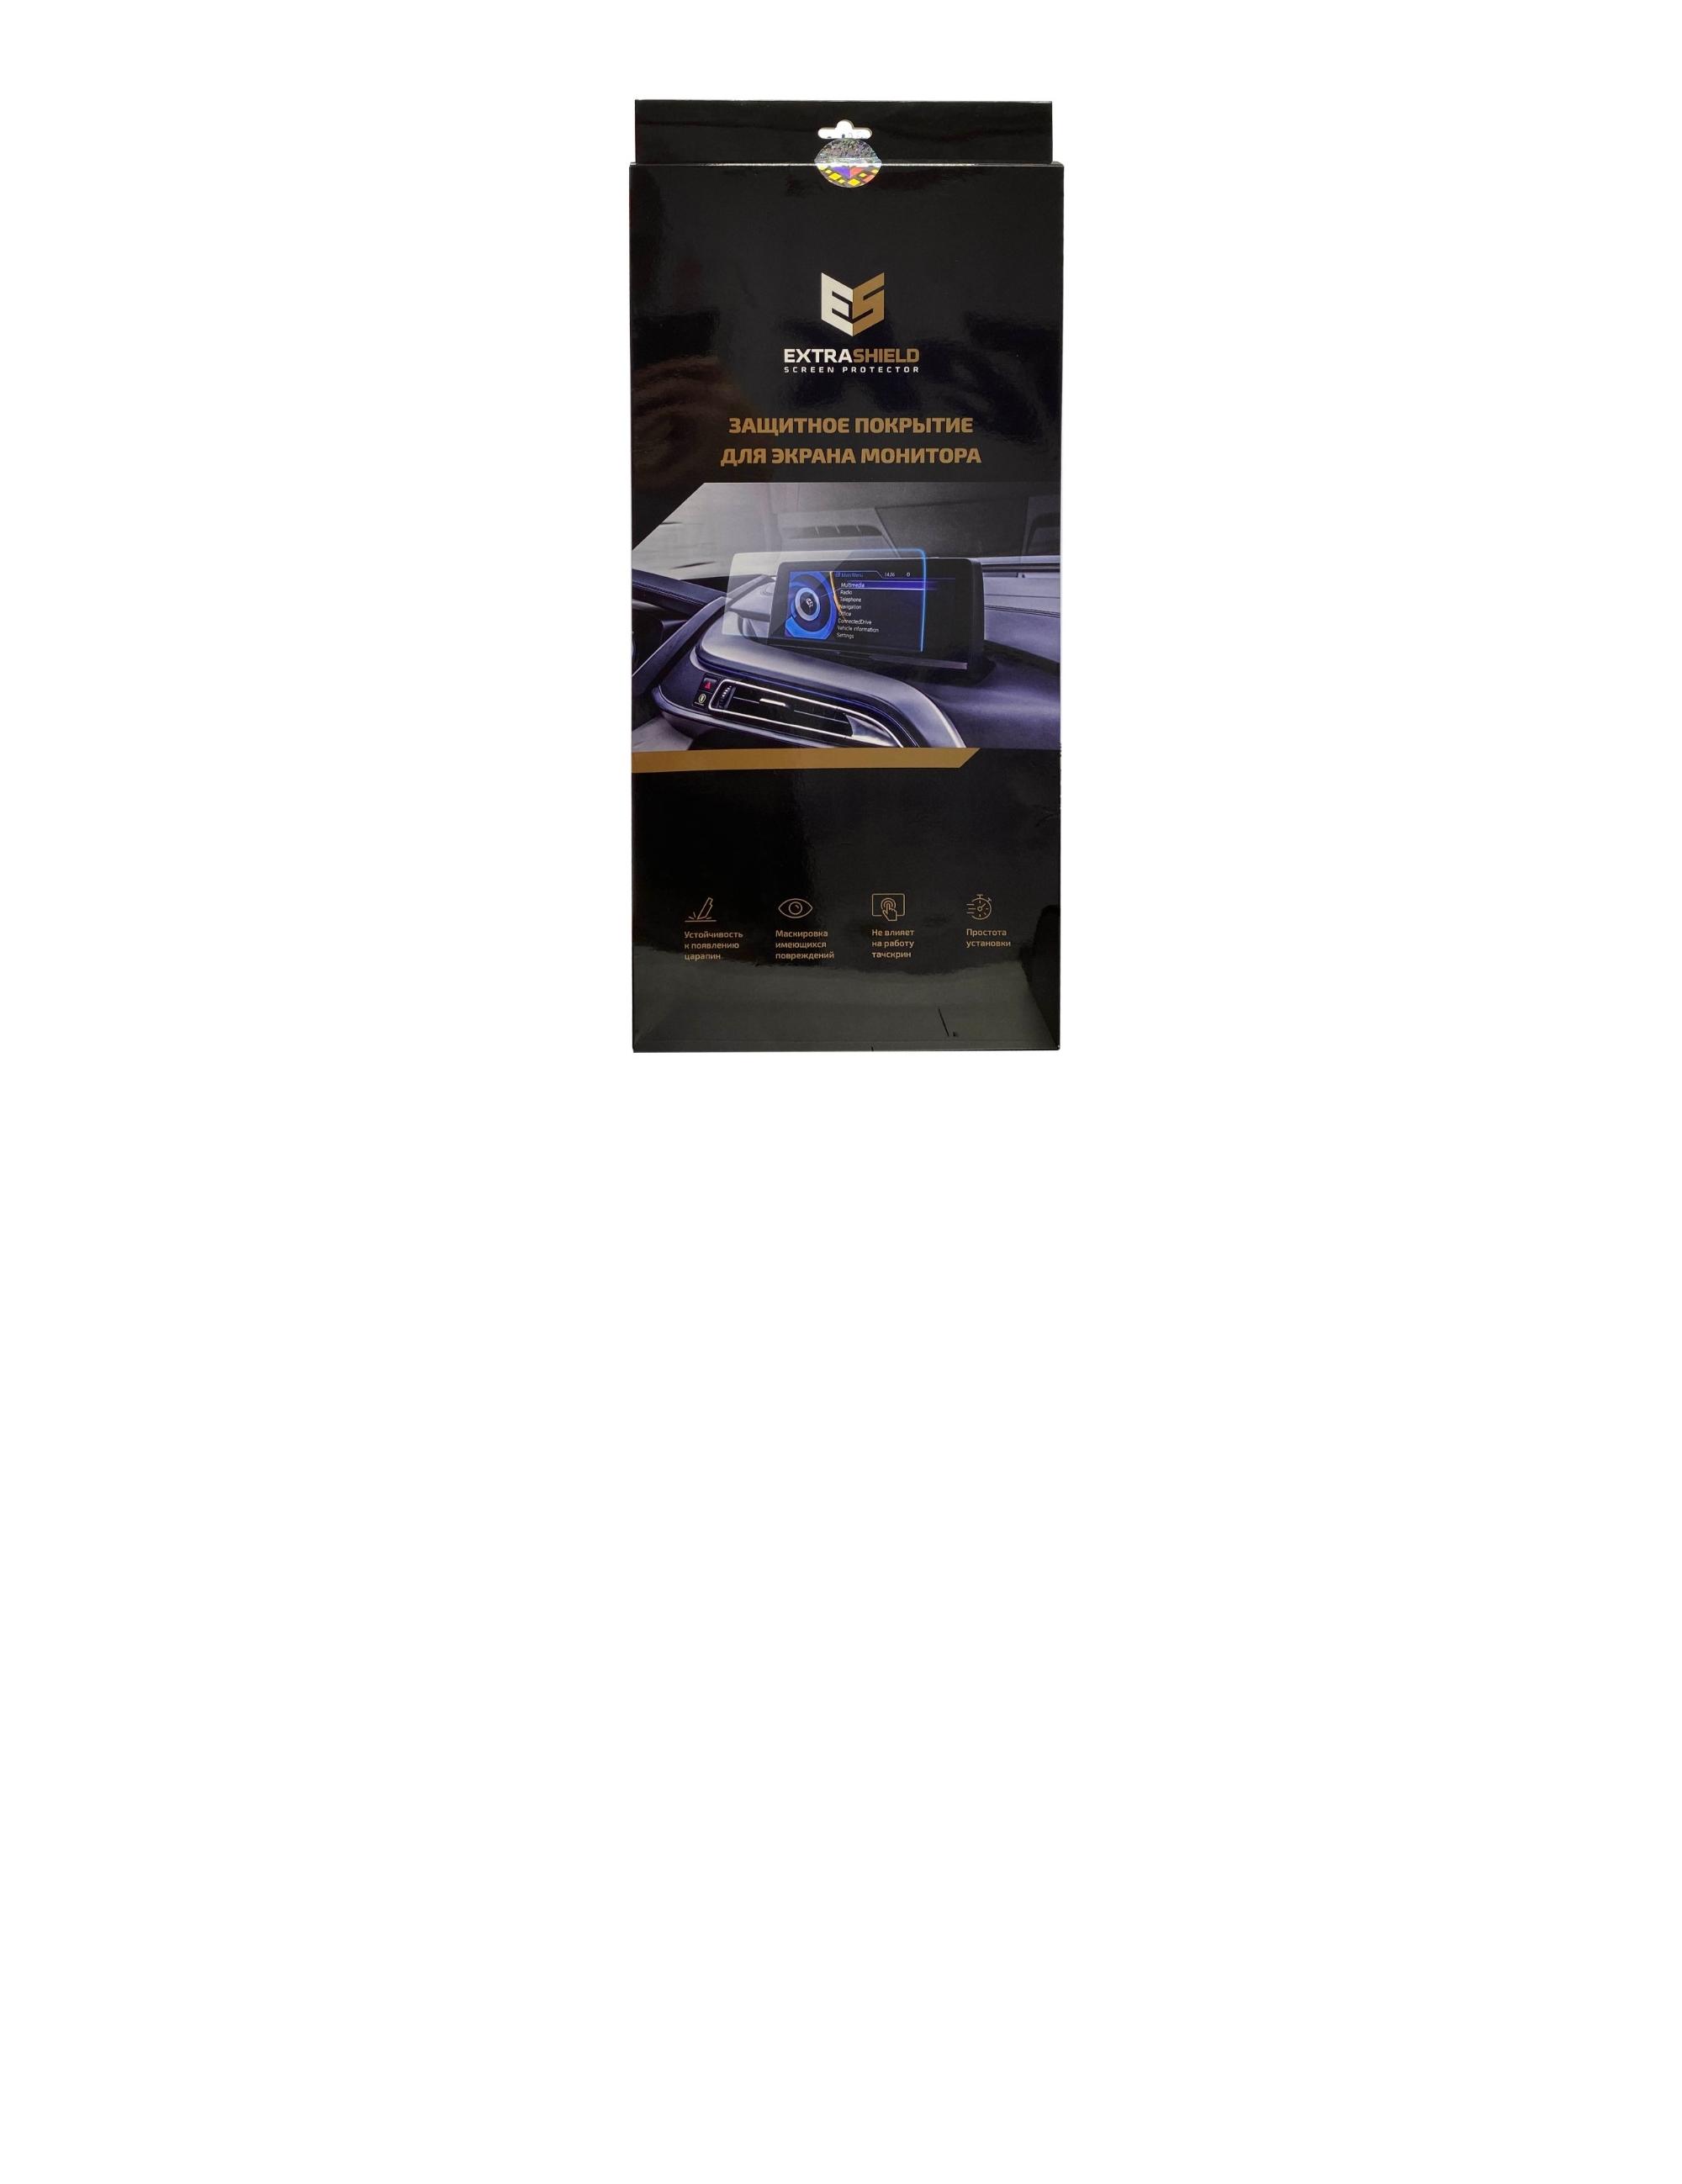 Volkswagen Jetta 2014 - 2018 мультимедиа Discover Media 8 Защитное стекло Глянец